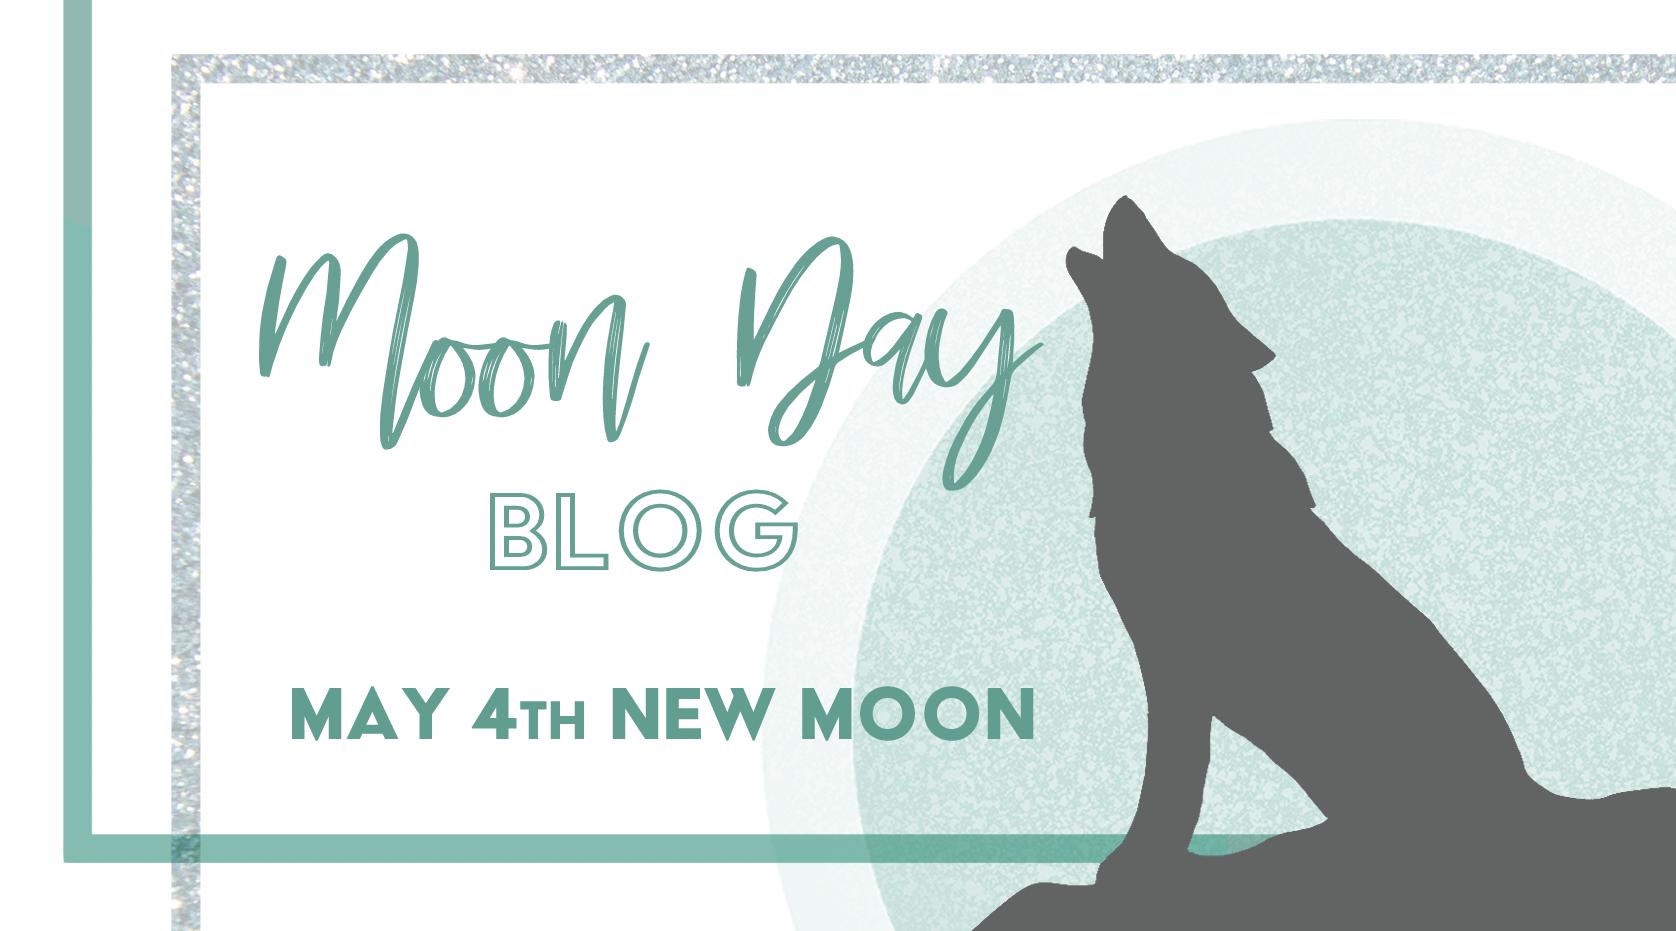 Moon Day – May 4th New Moon